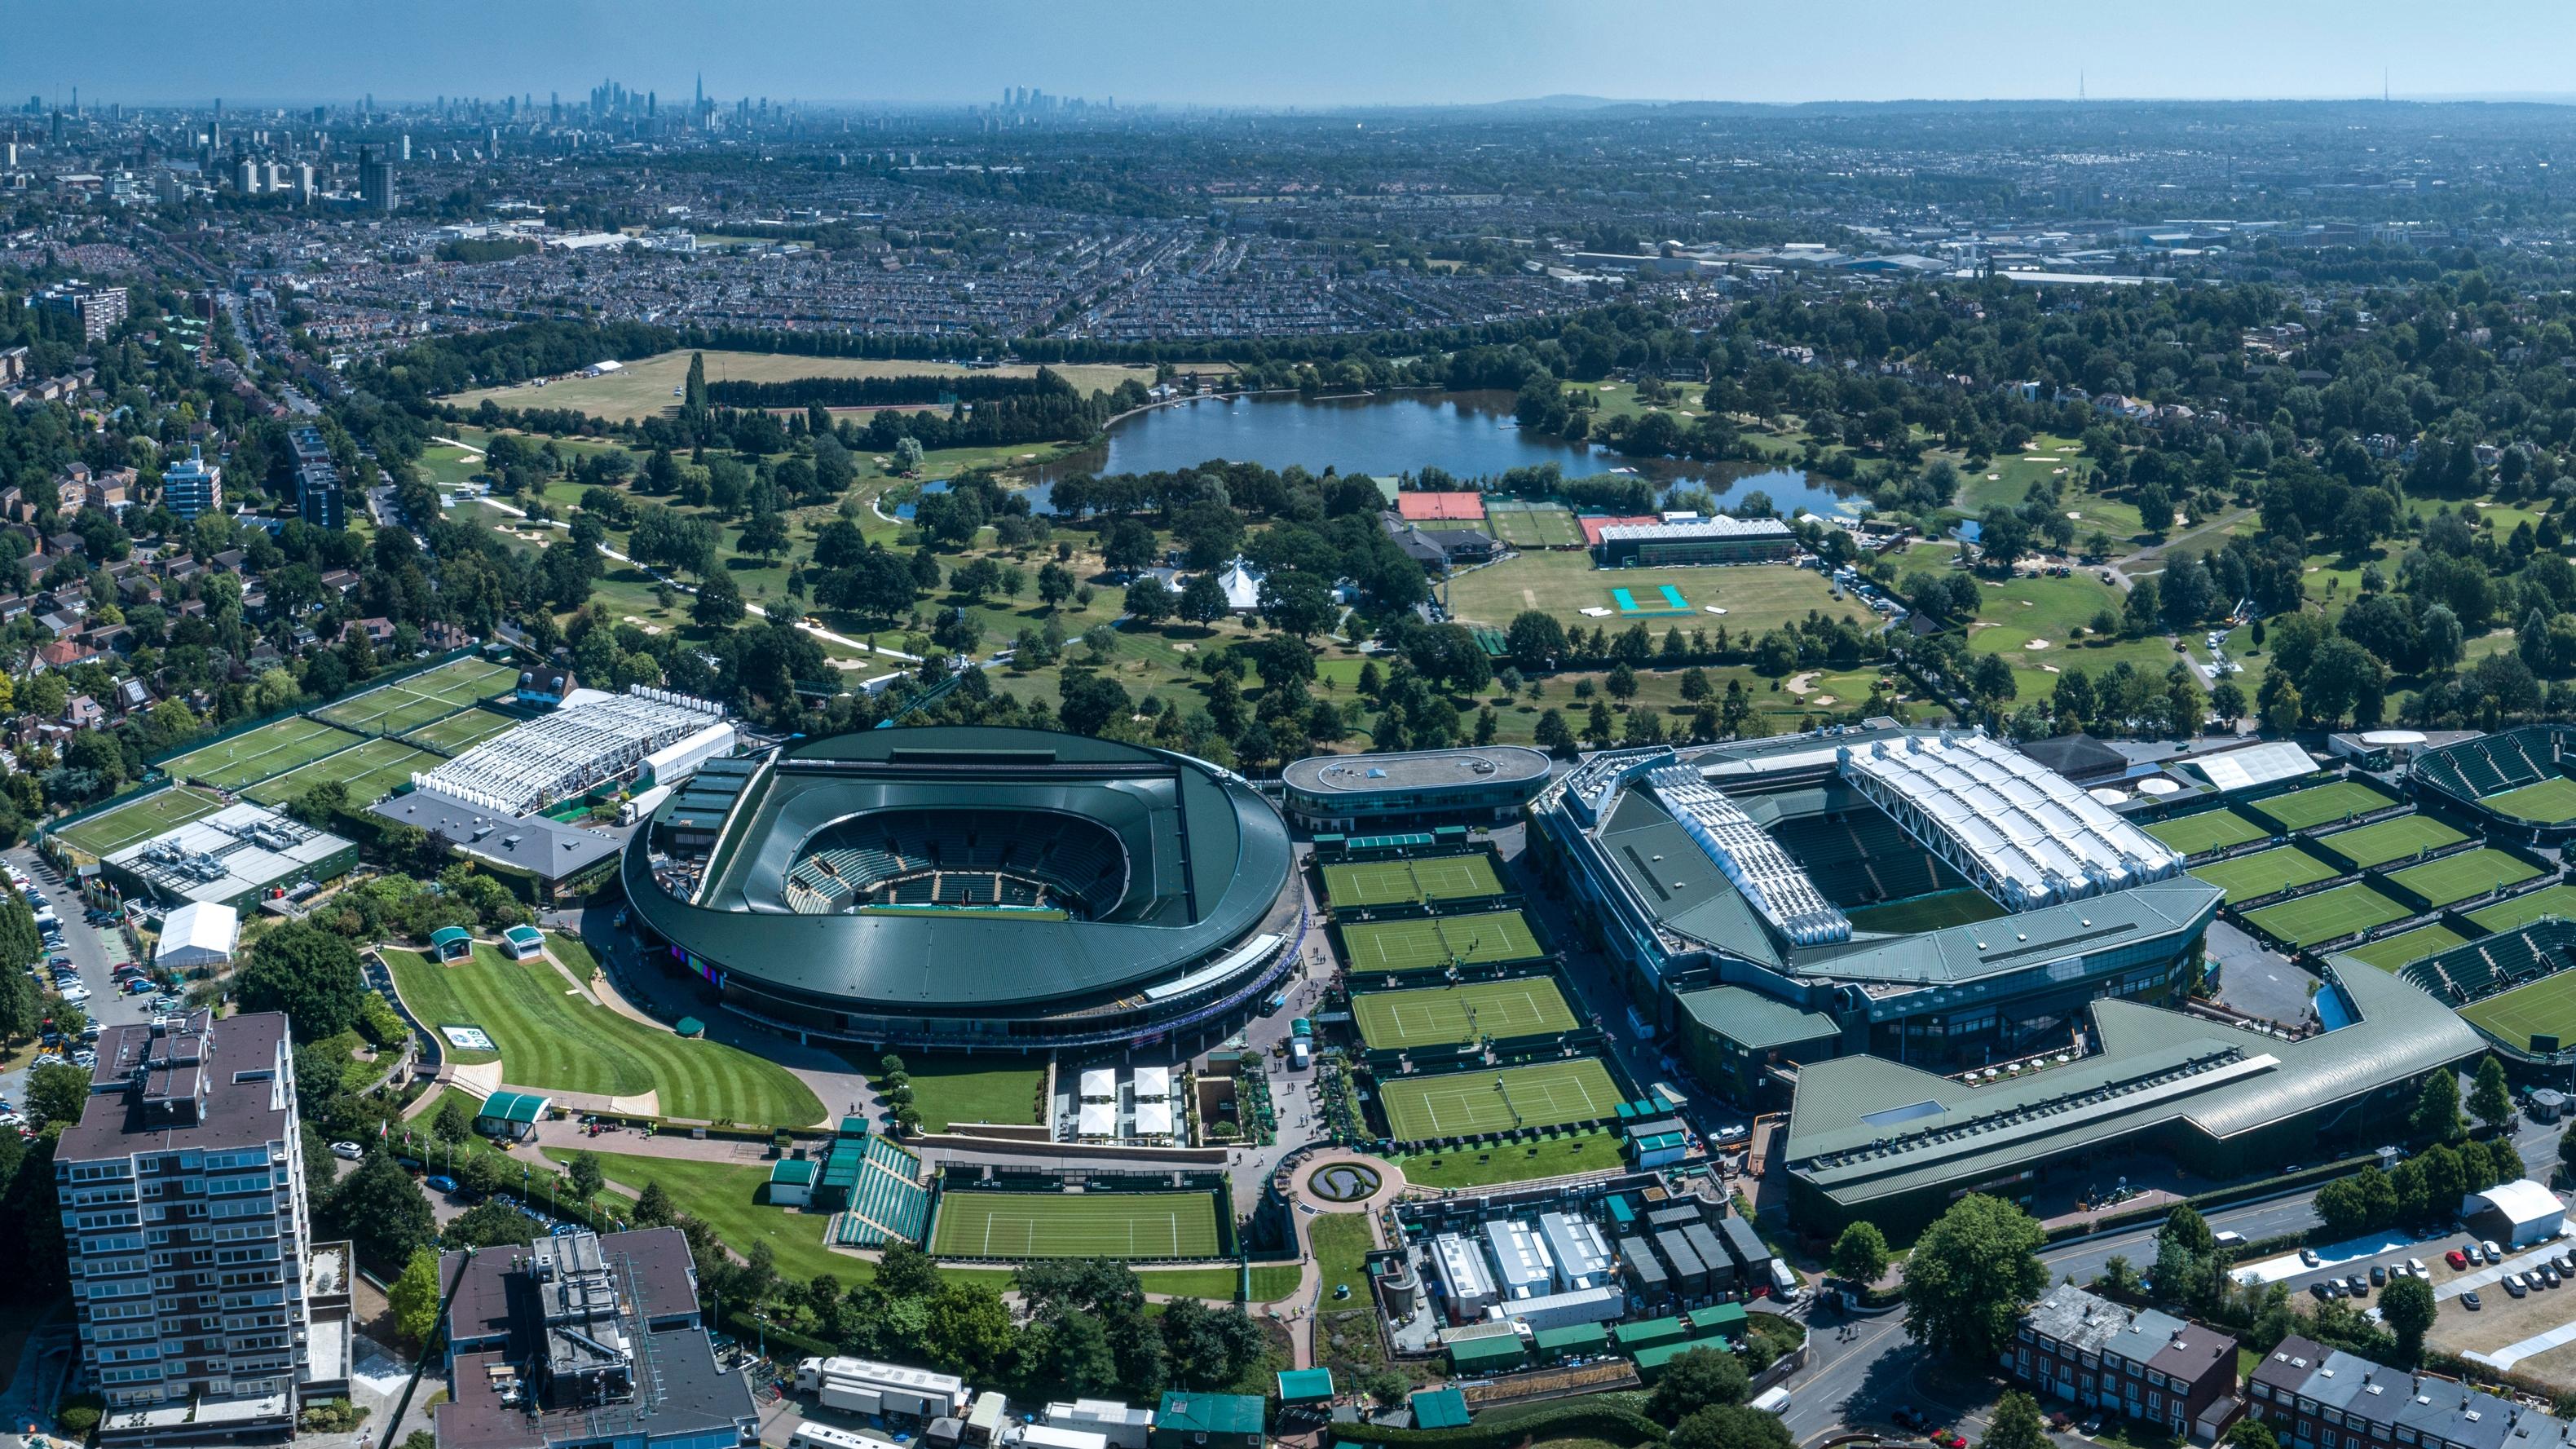 Wimbledon all england club wimbledon park golf club